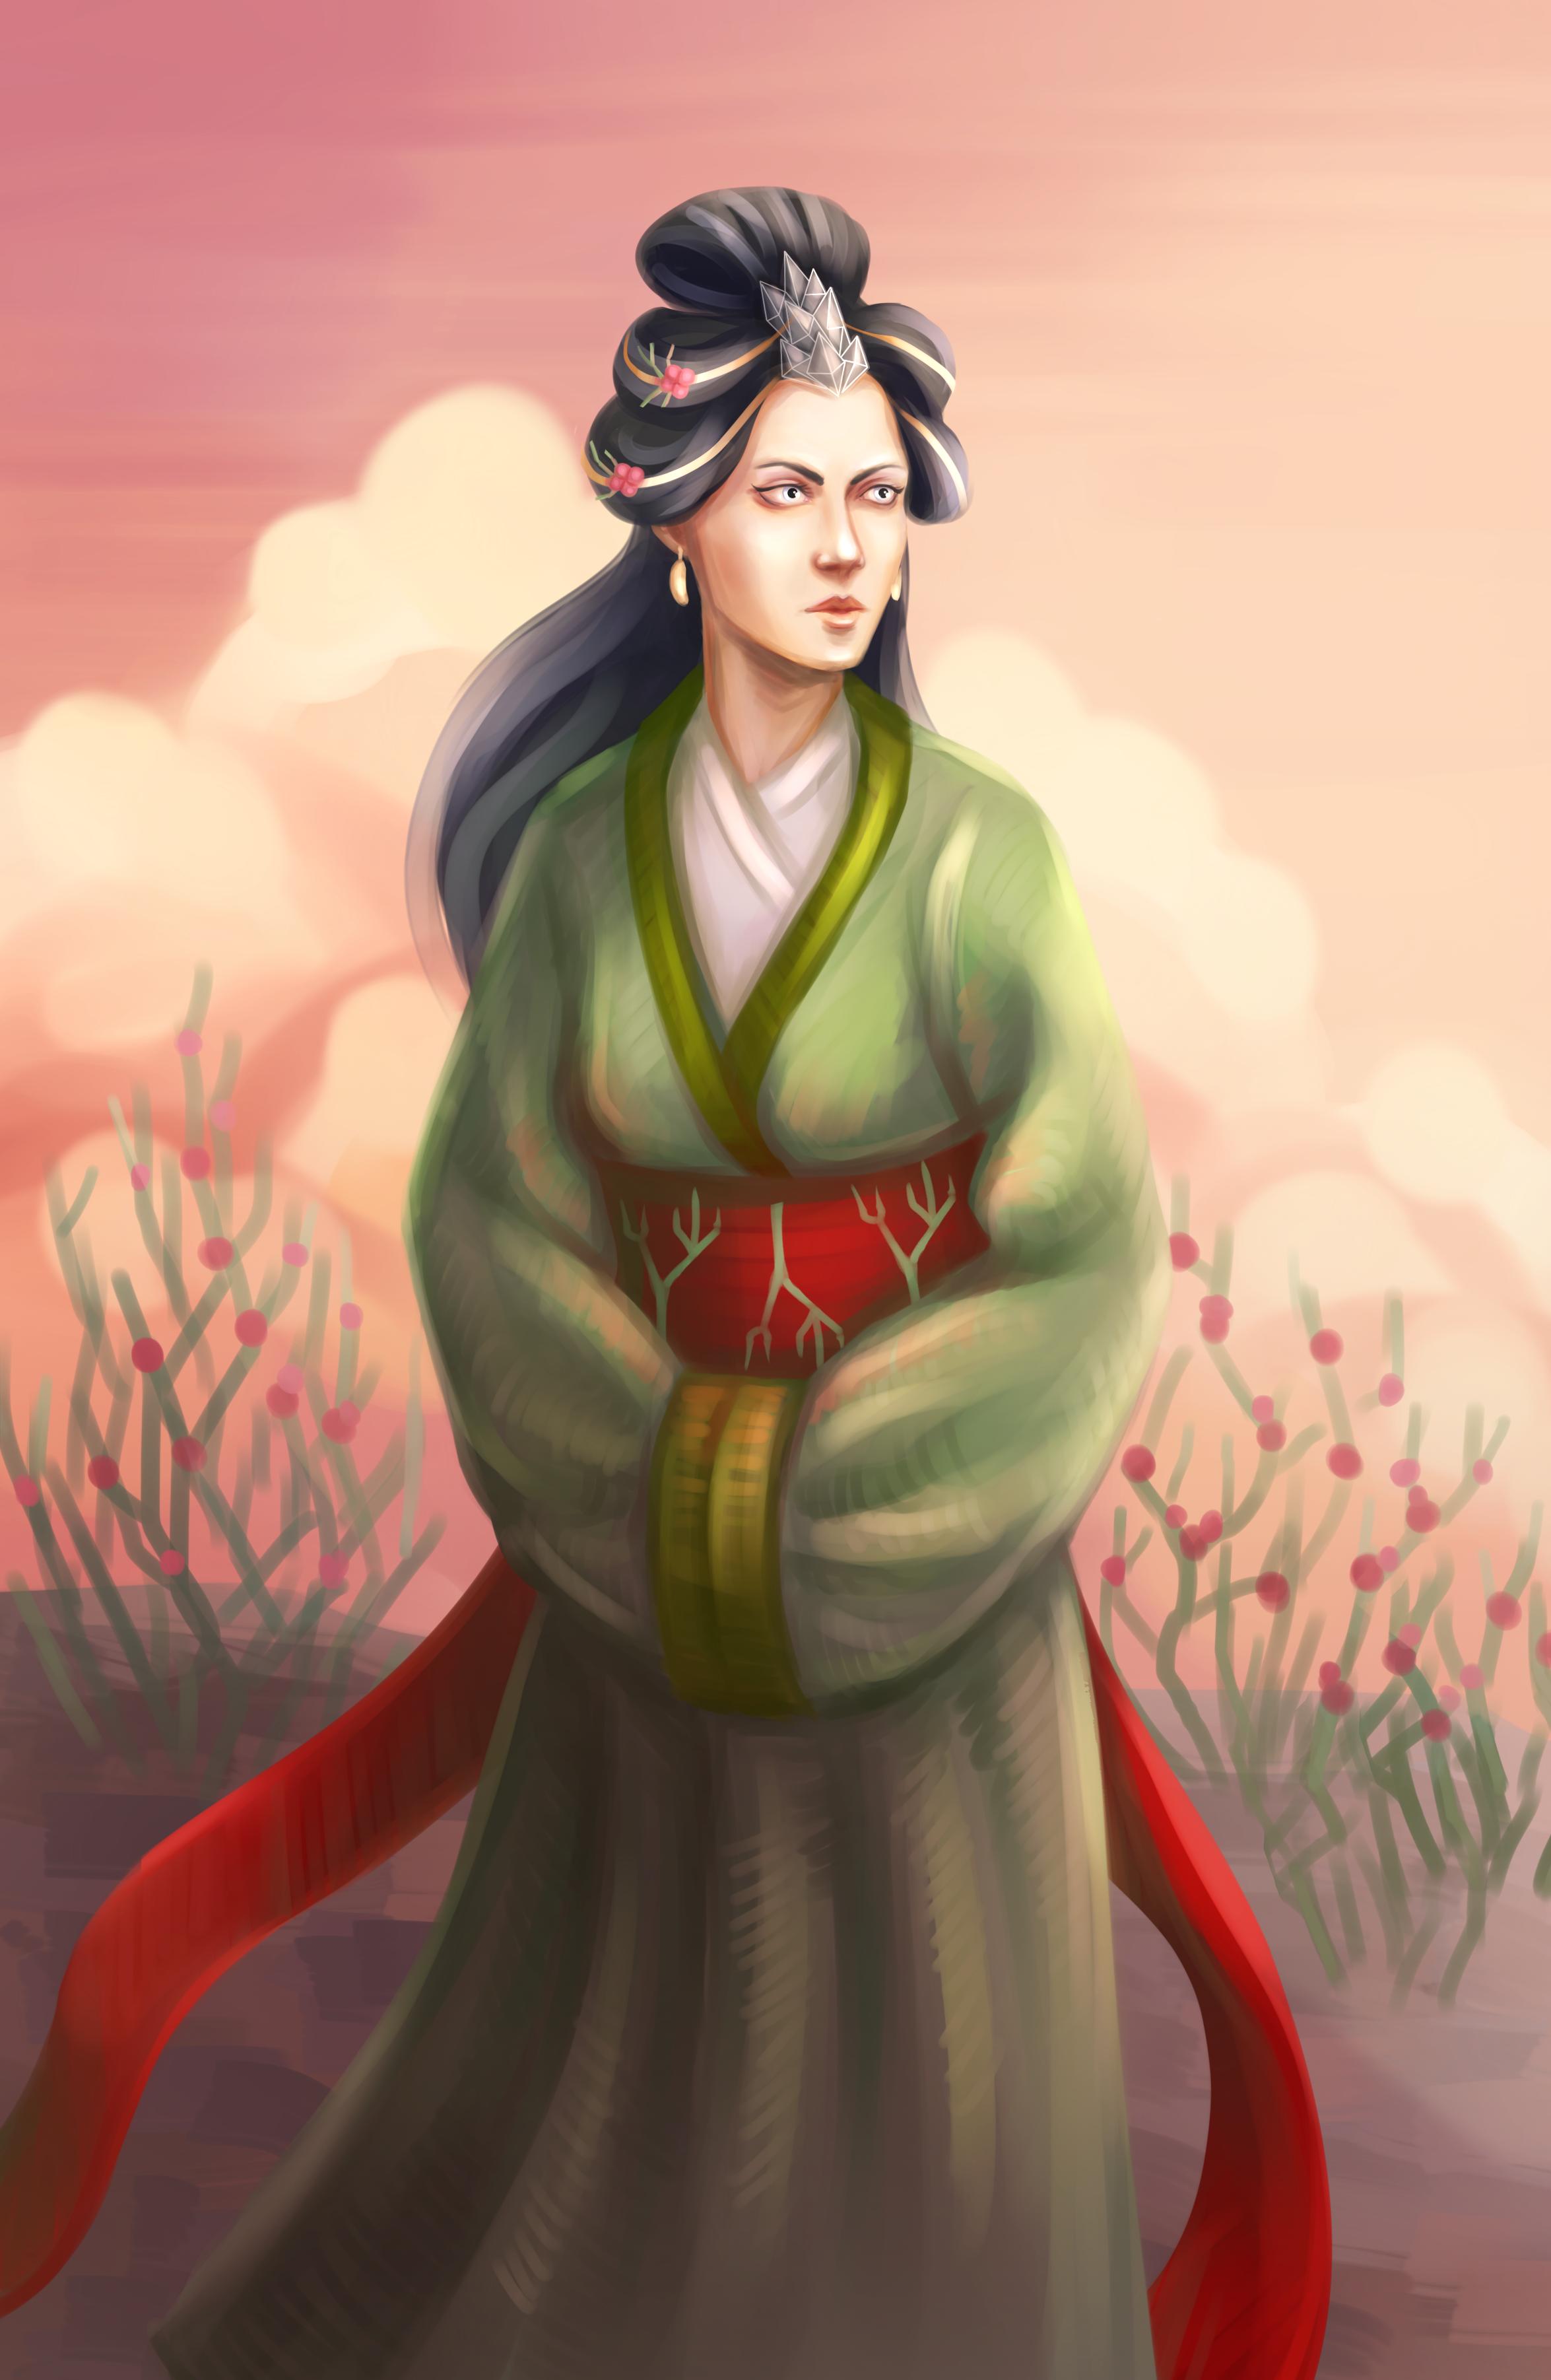 Mah Huang